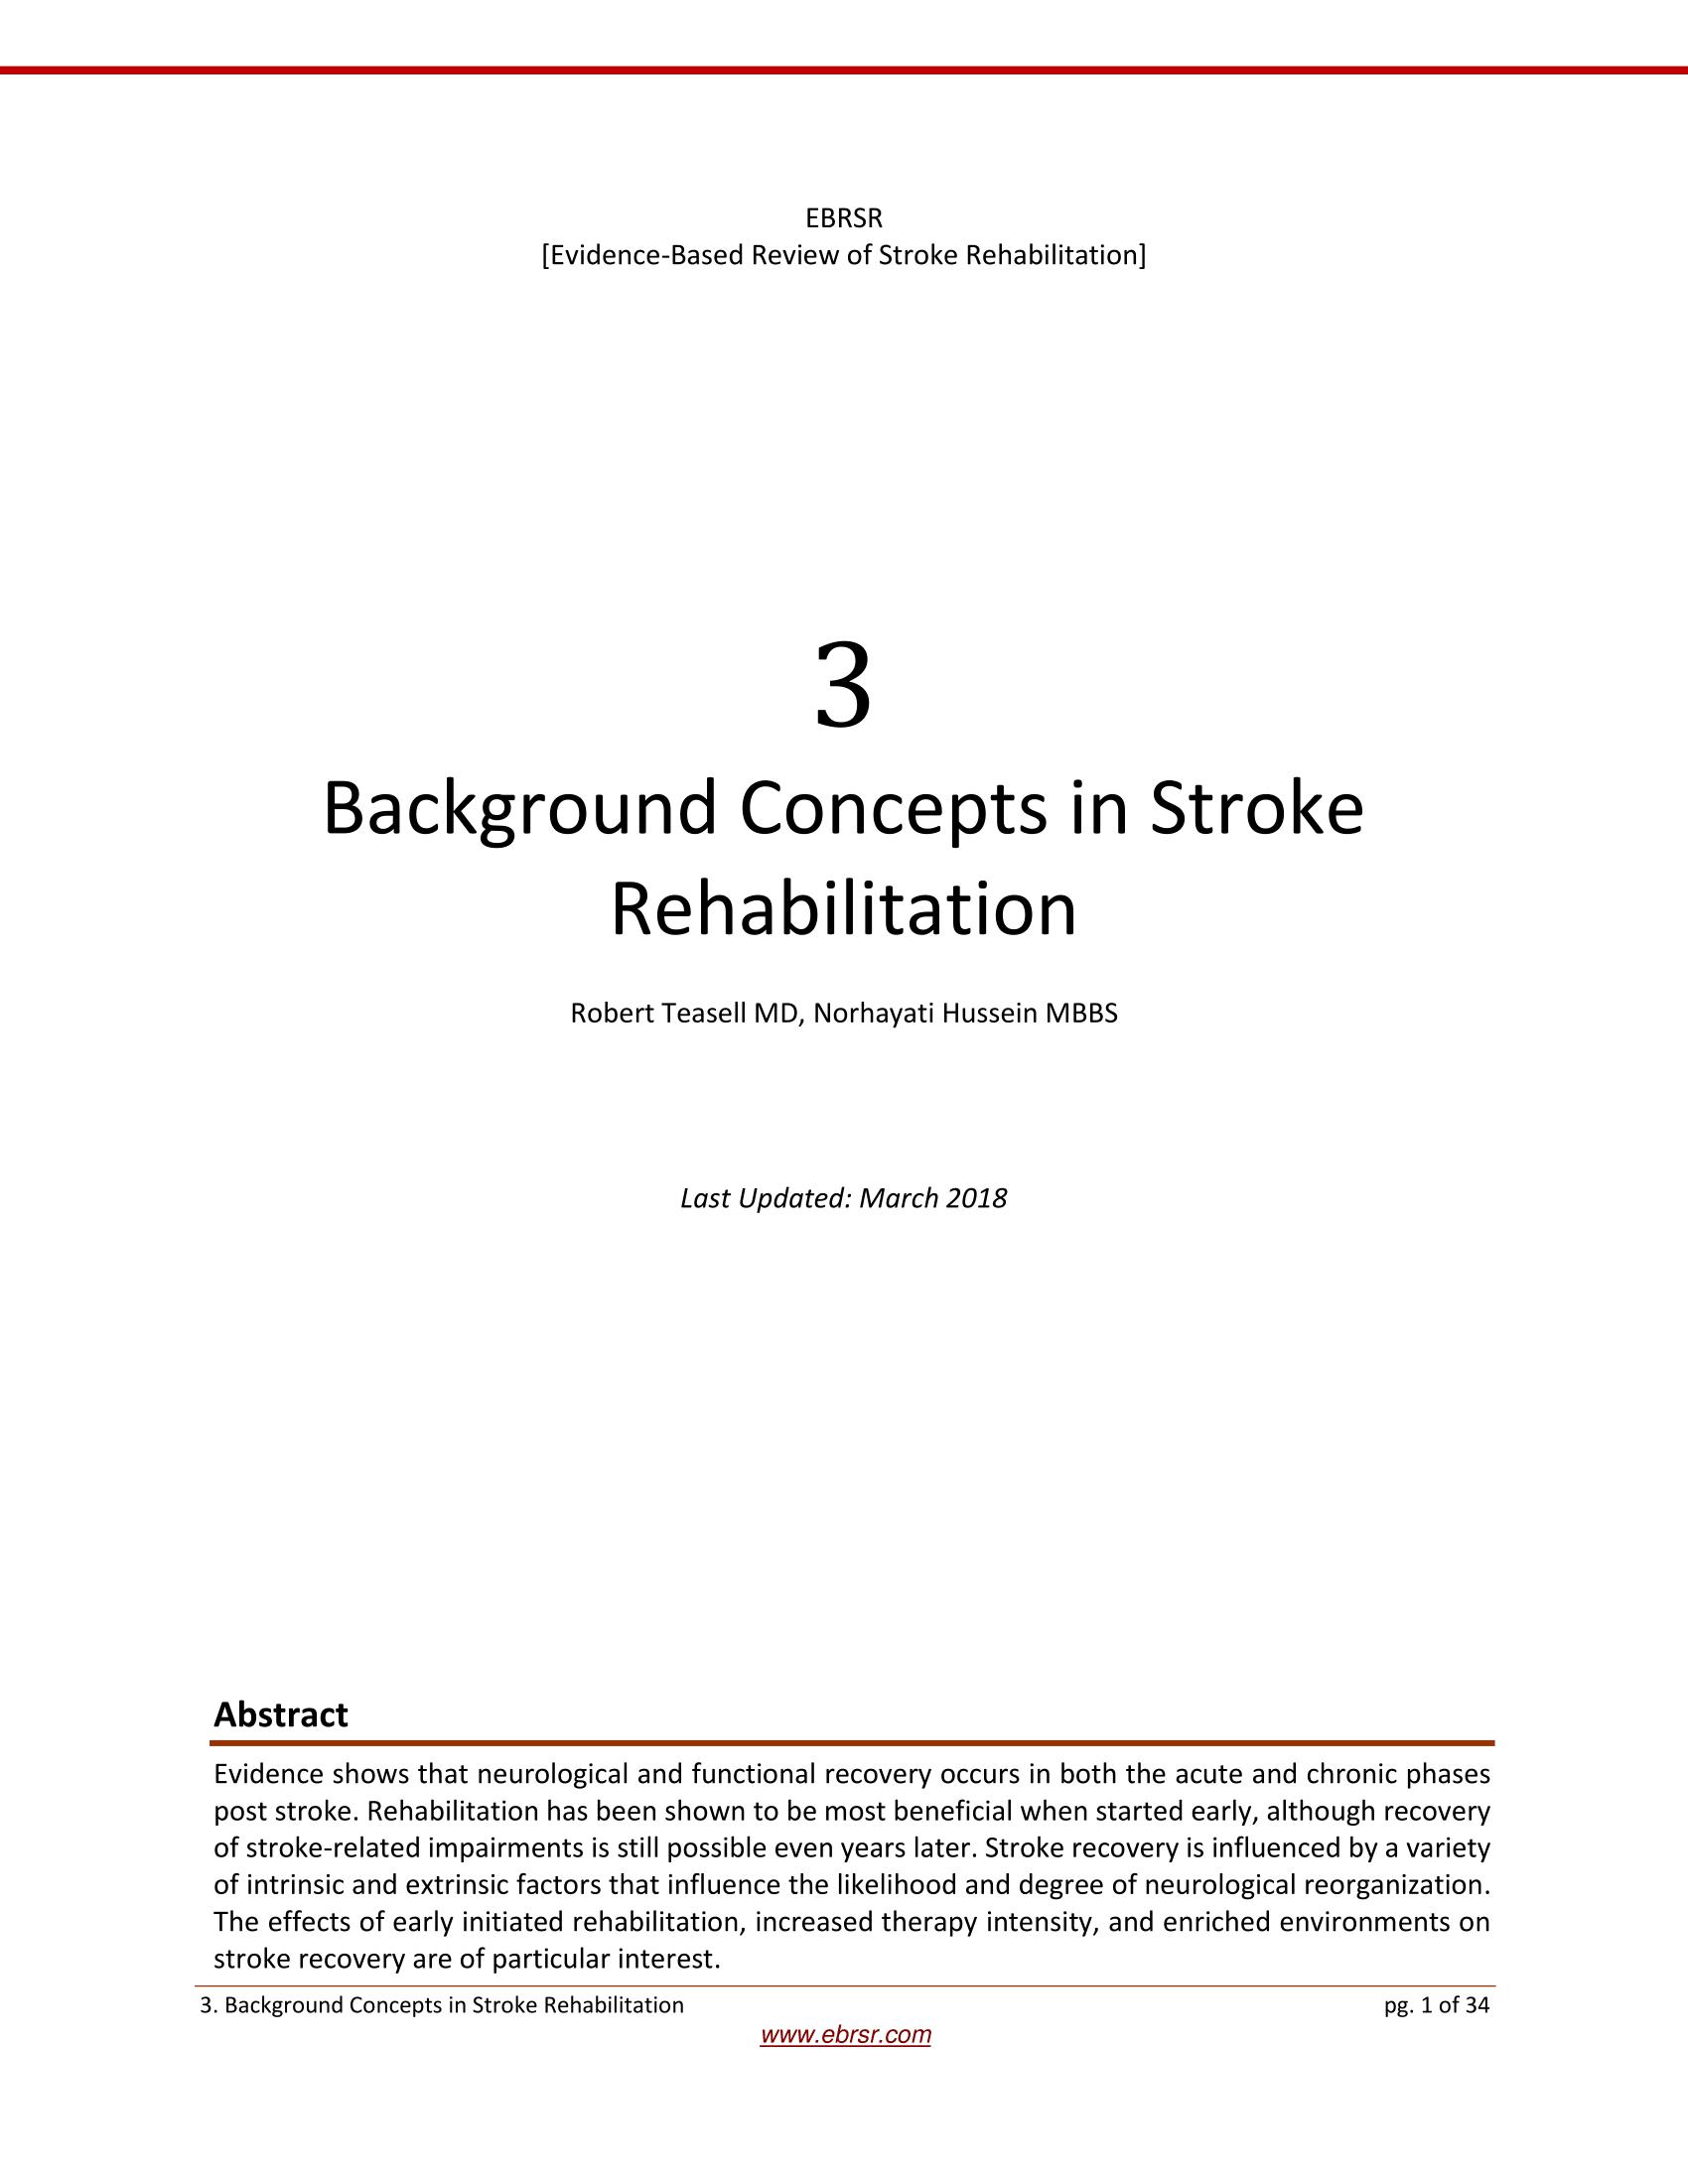 Background Concepts in Stroke Rehabilitation   EBRSR - Evidence